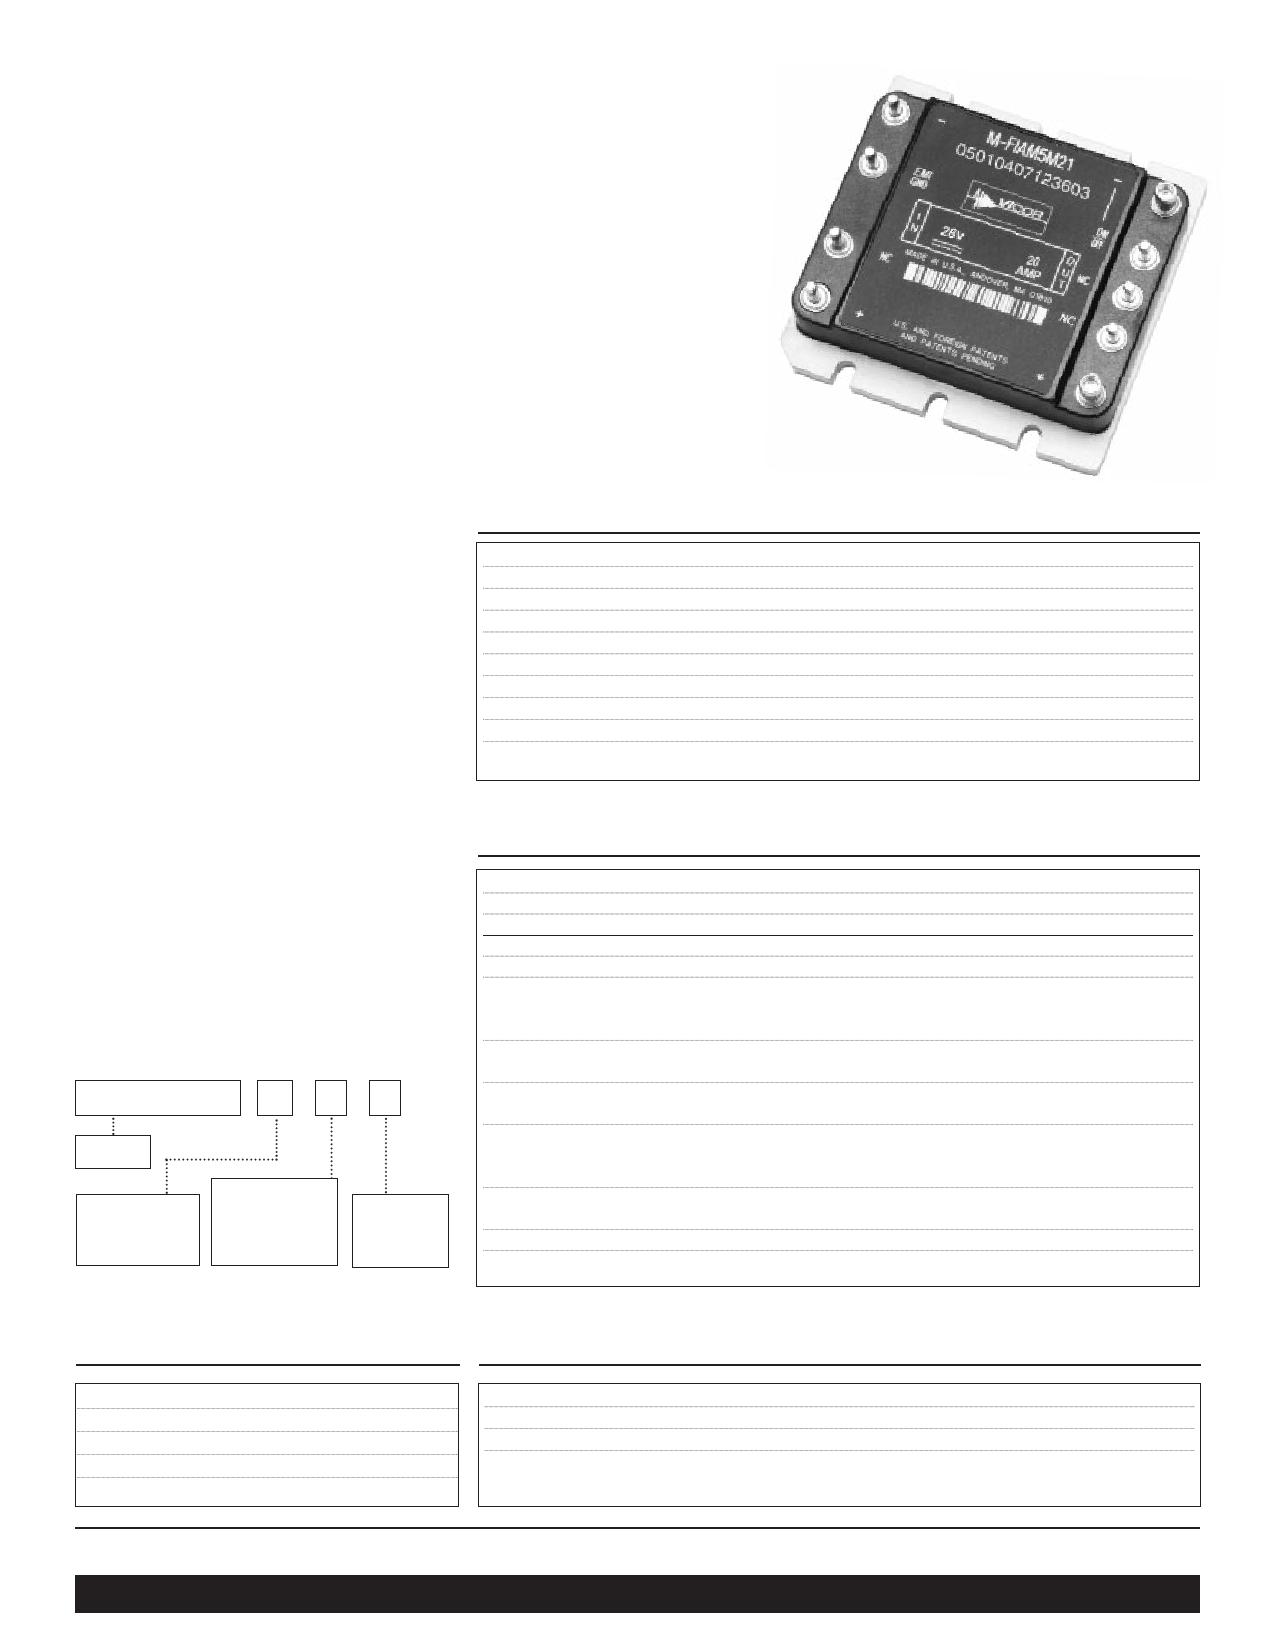 M-FIAM5HN3 datasheet